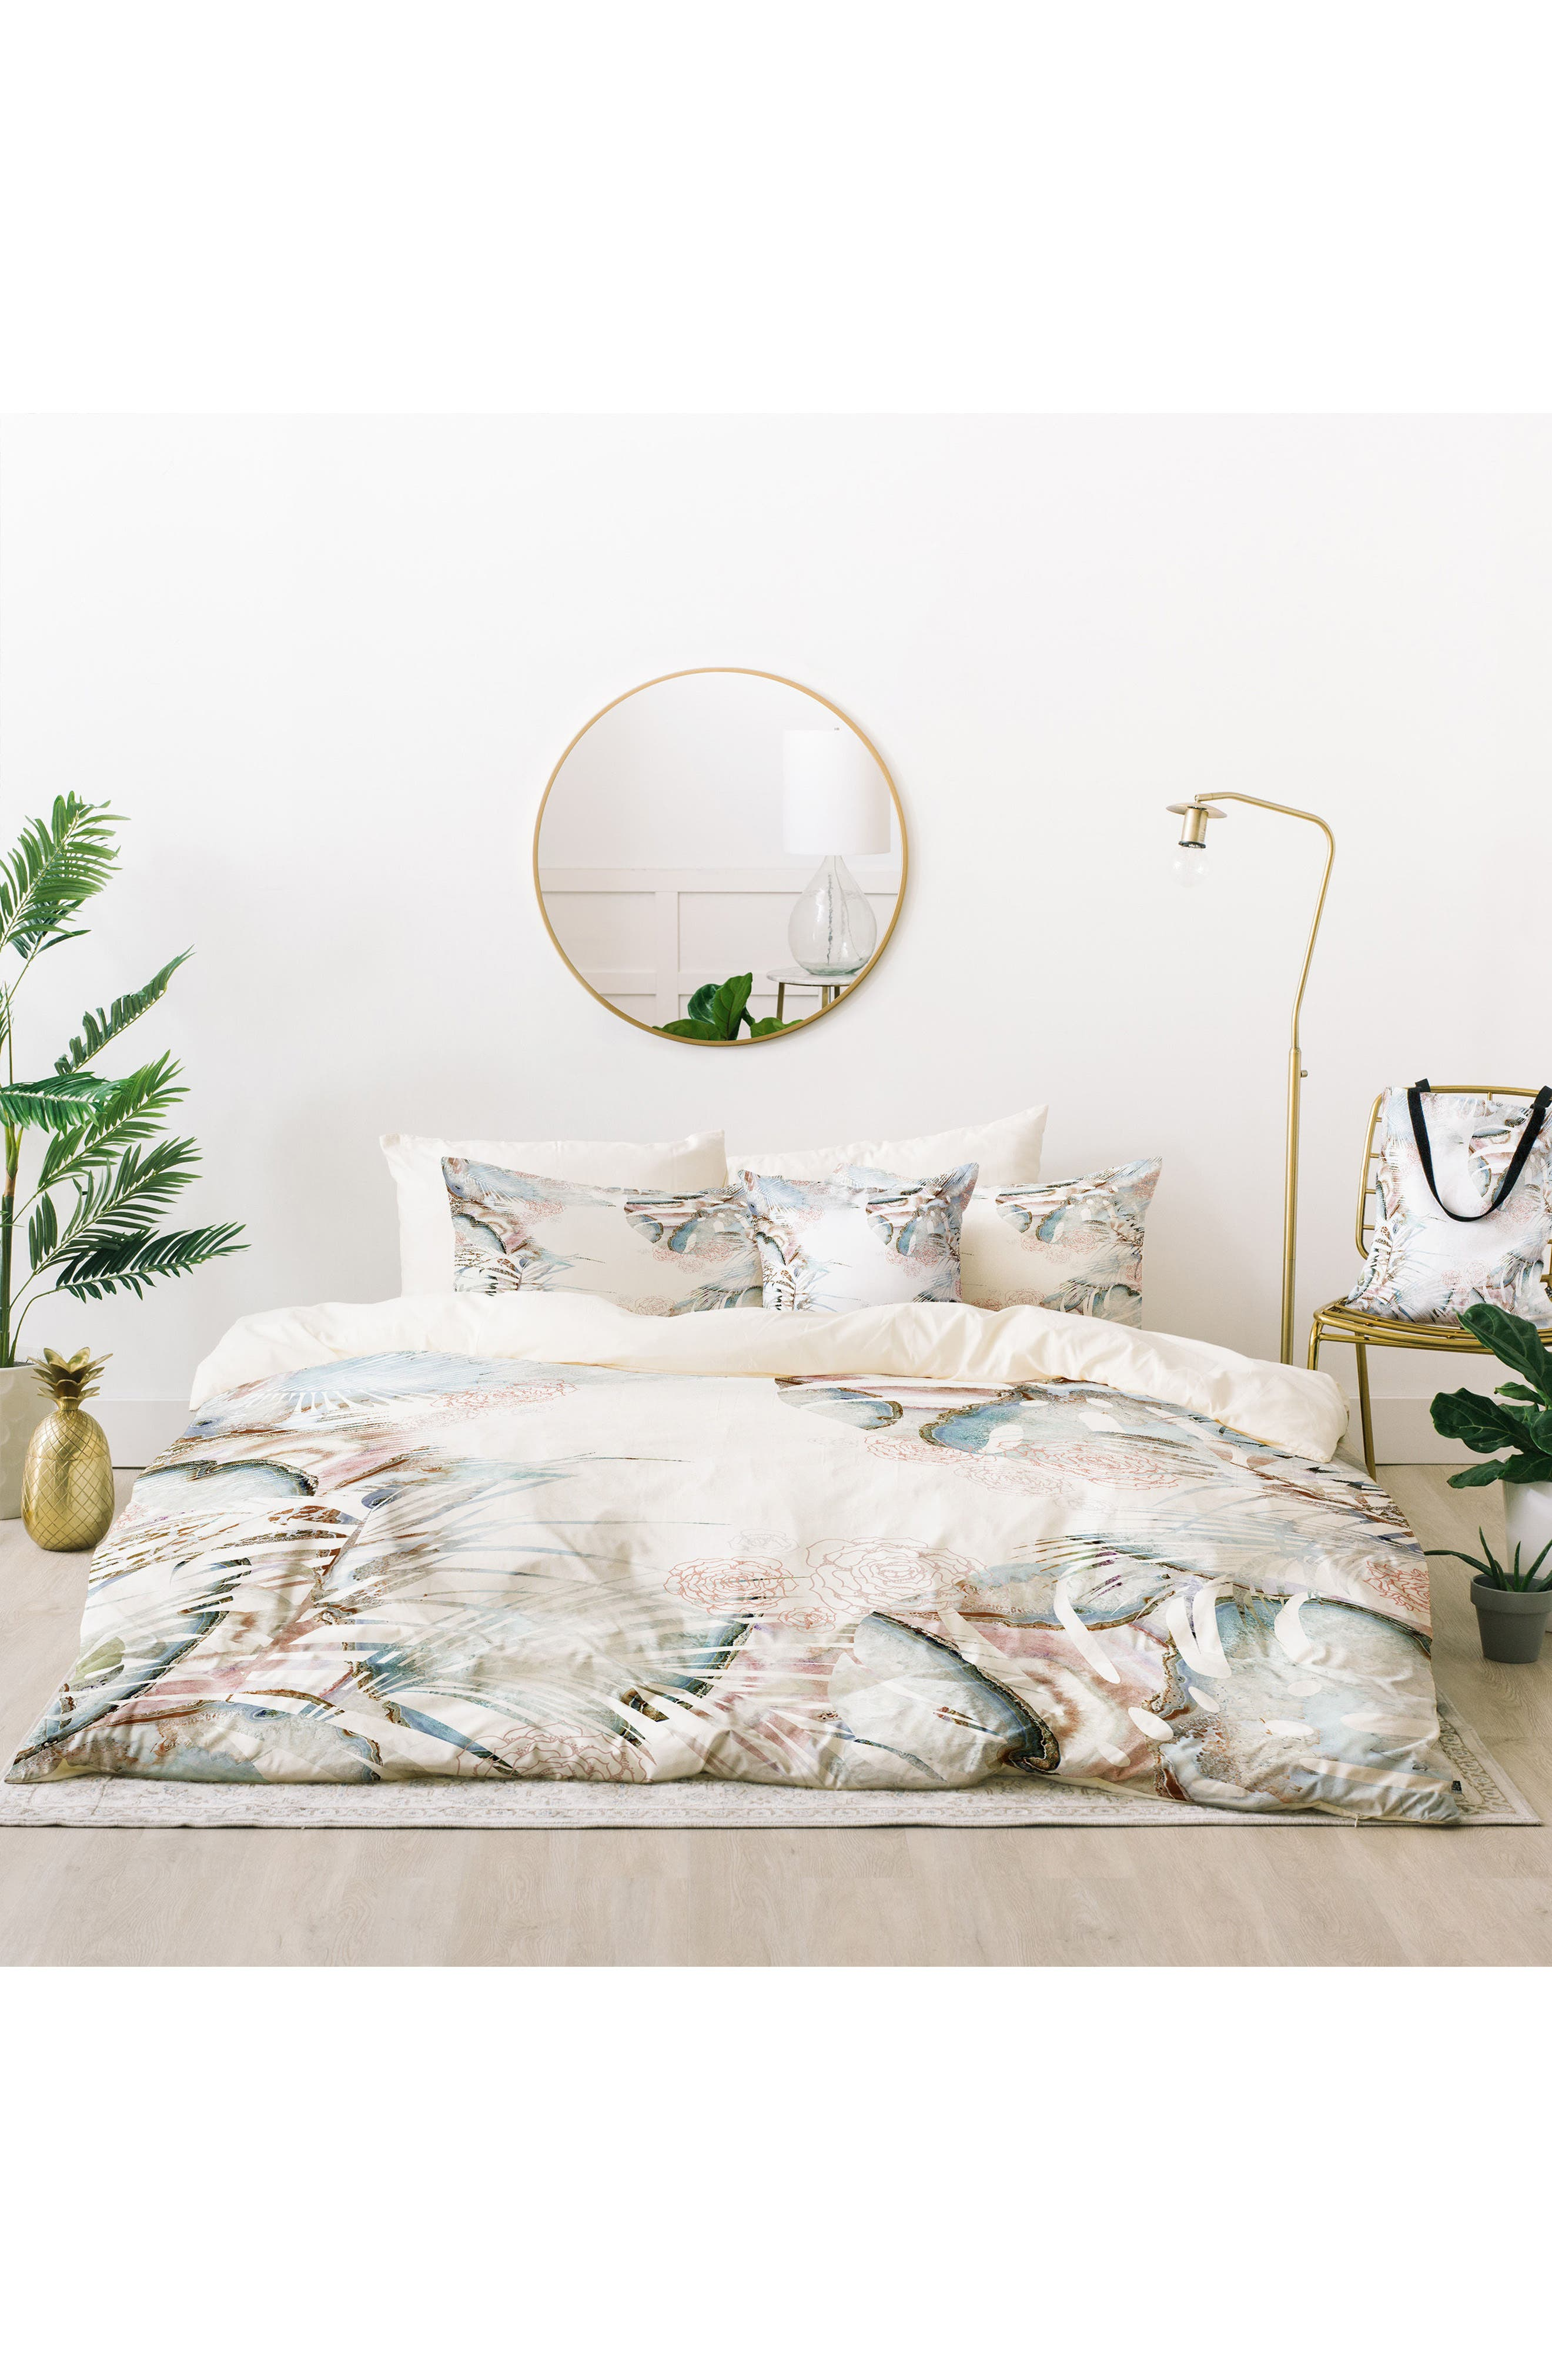 Iveta Abolina Honey It's Nap Time Bed in a Bag Duvet Cover, Sham & Accent Pillow Set,                         Main,                         color, Blue Multi